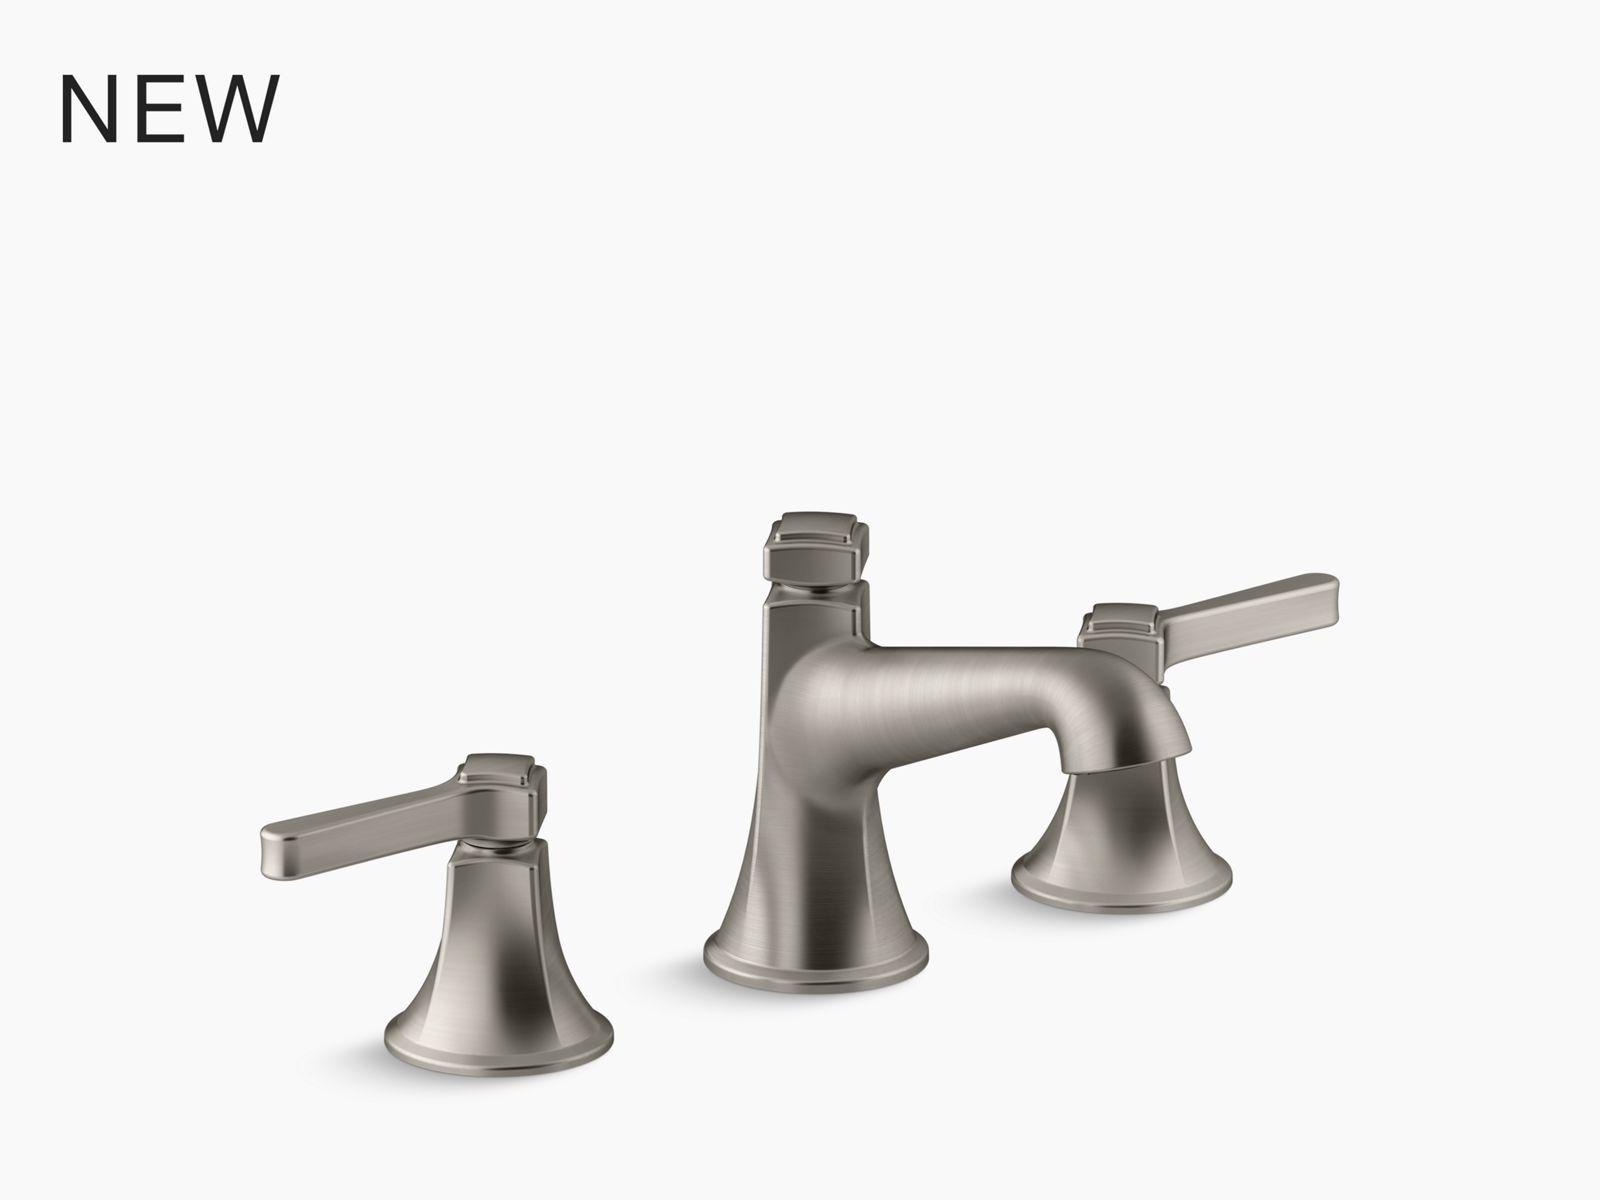 K 2344 8 Memoirs Pedestal Sink With Stately Design 8 Inch Centers KOHLER